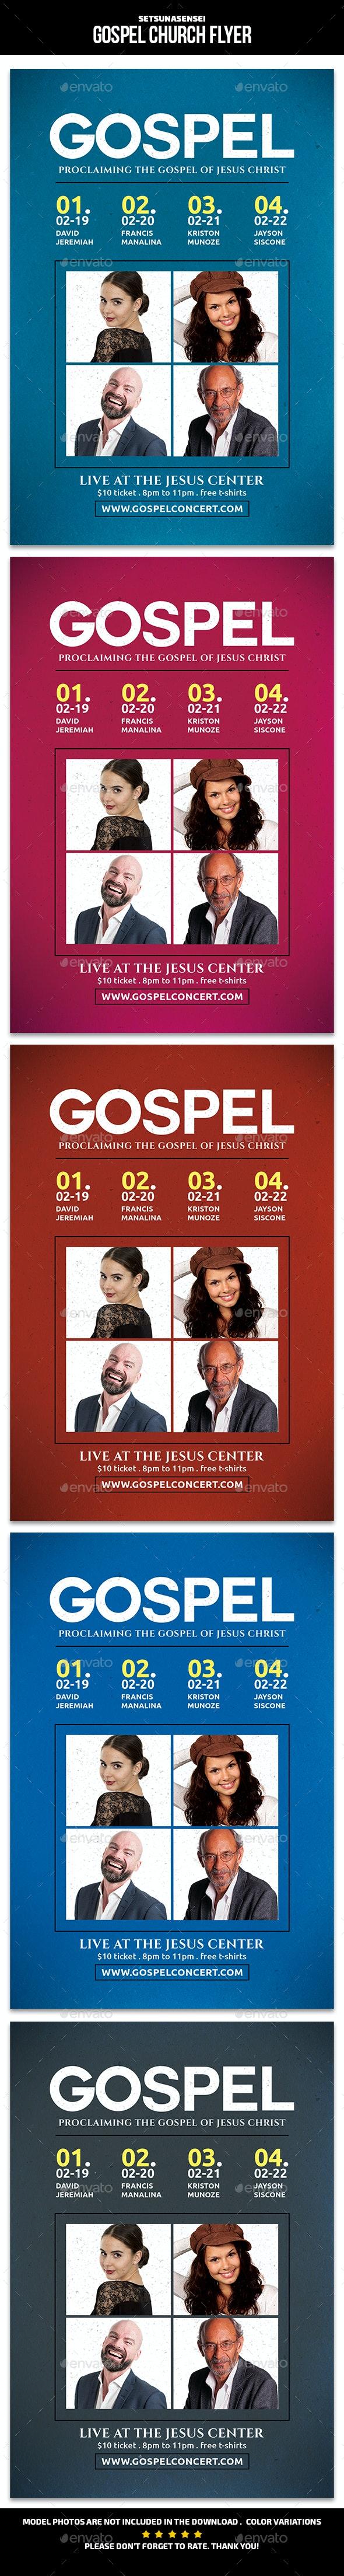 Gospel Church Flyer - Church Flyers